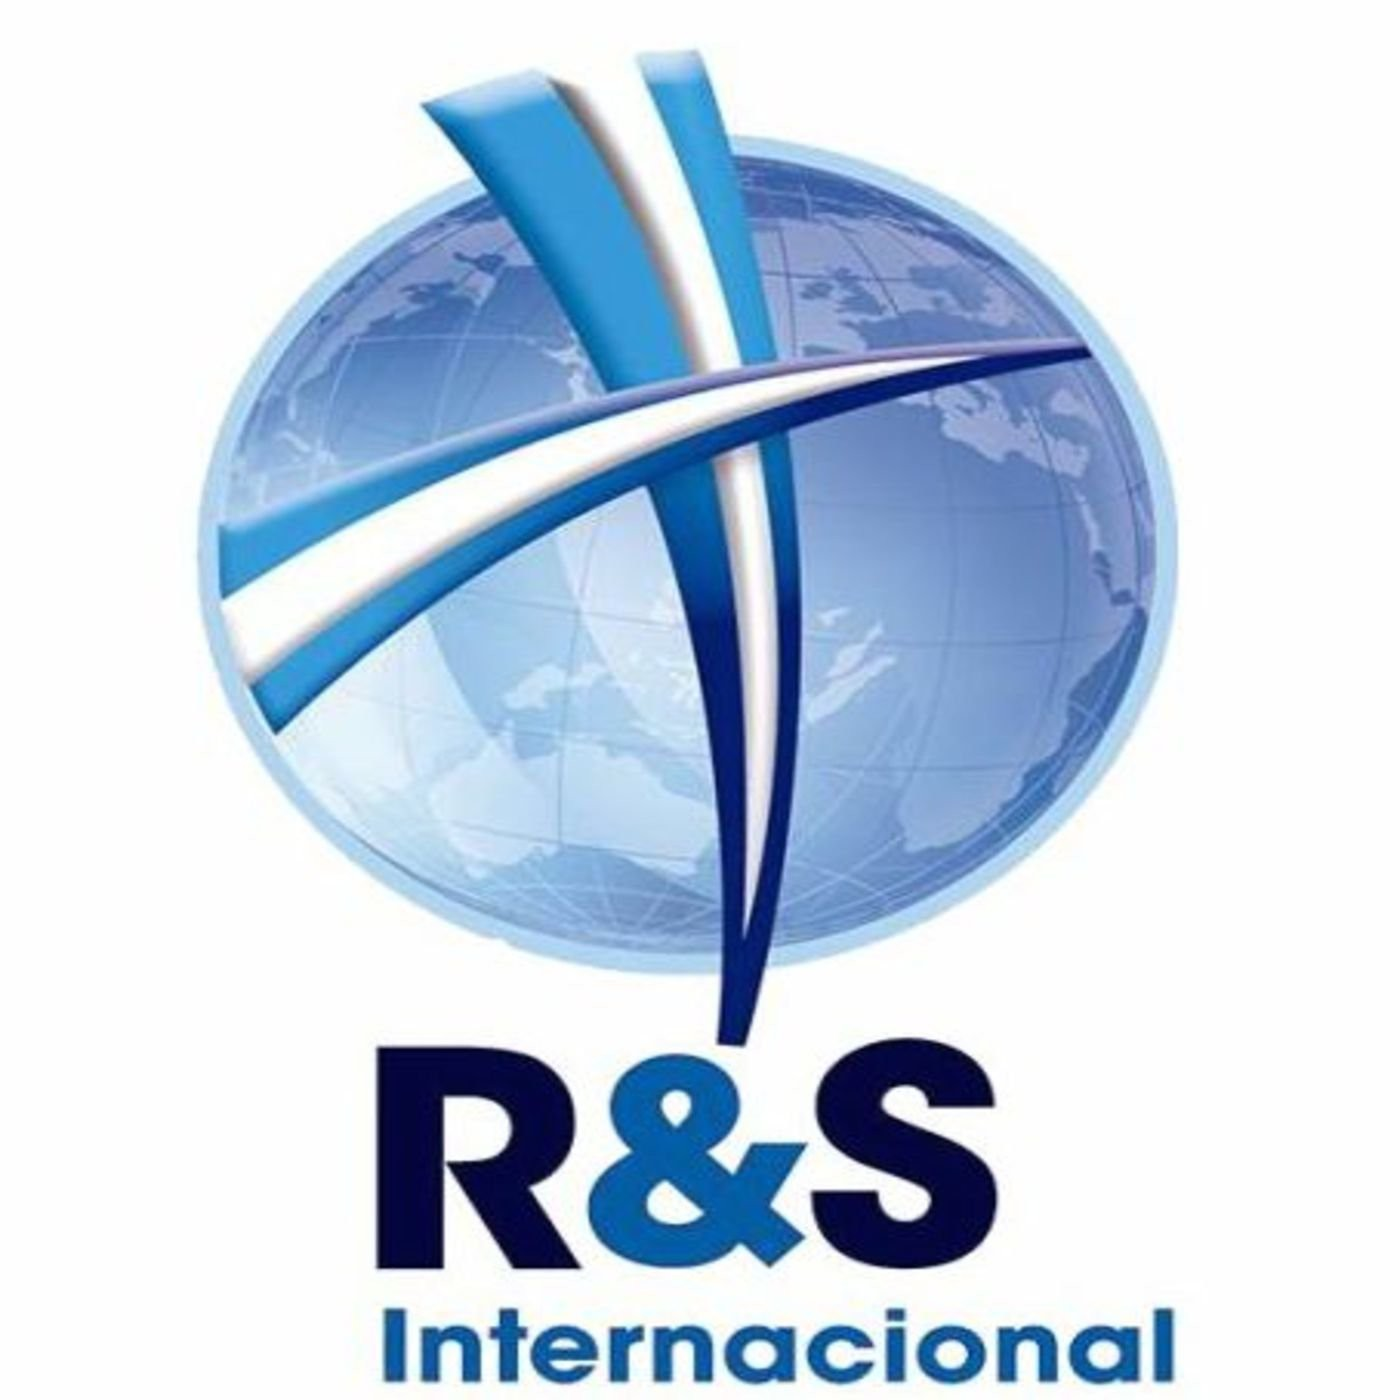 <![CDATA[Podcast de Reyes&Sacerdotes]]>